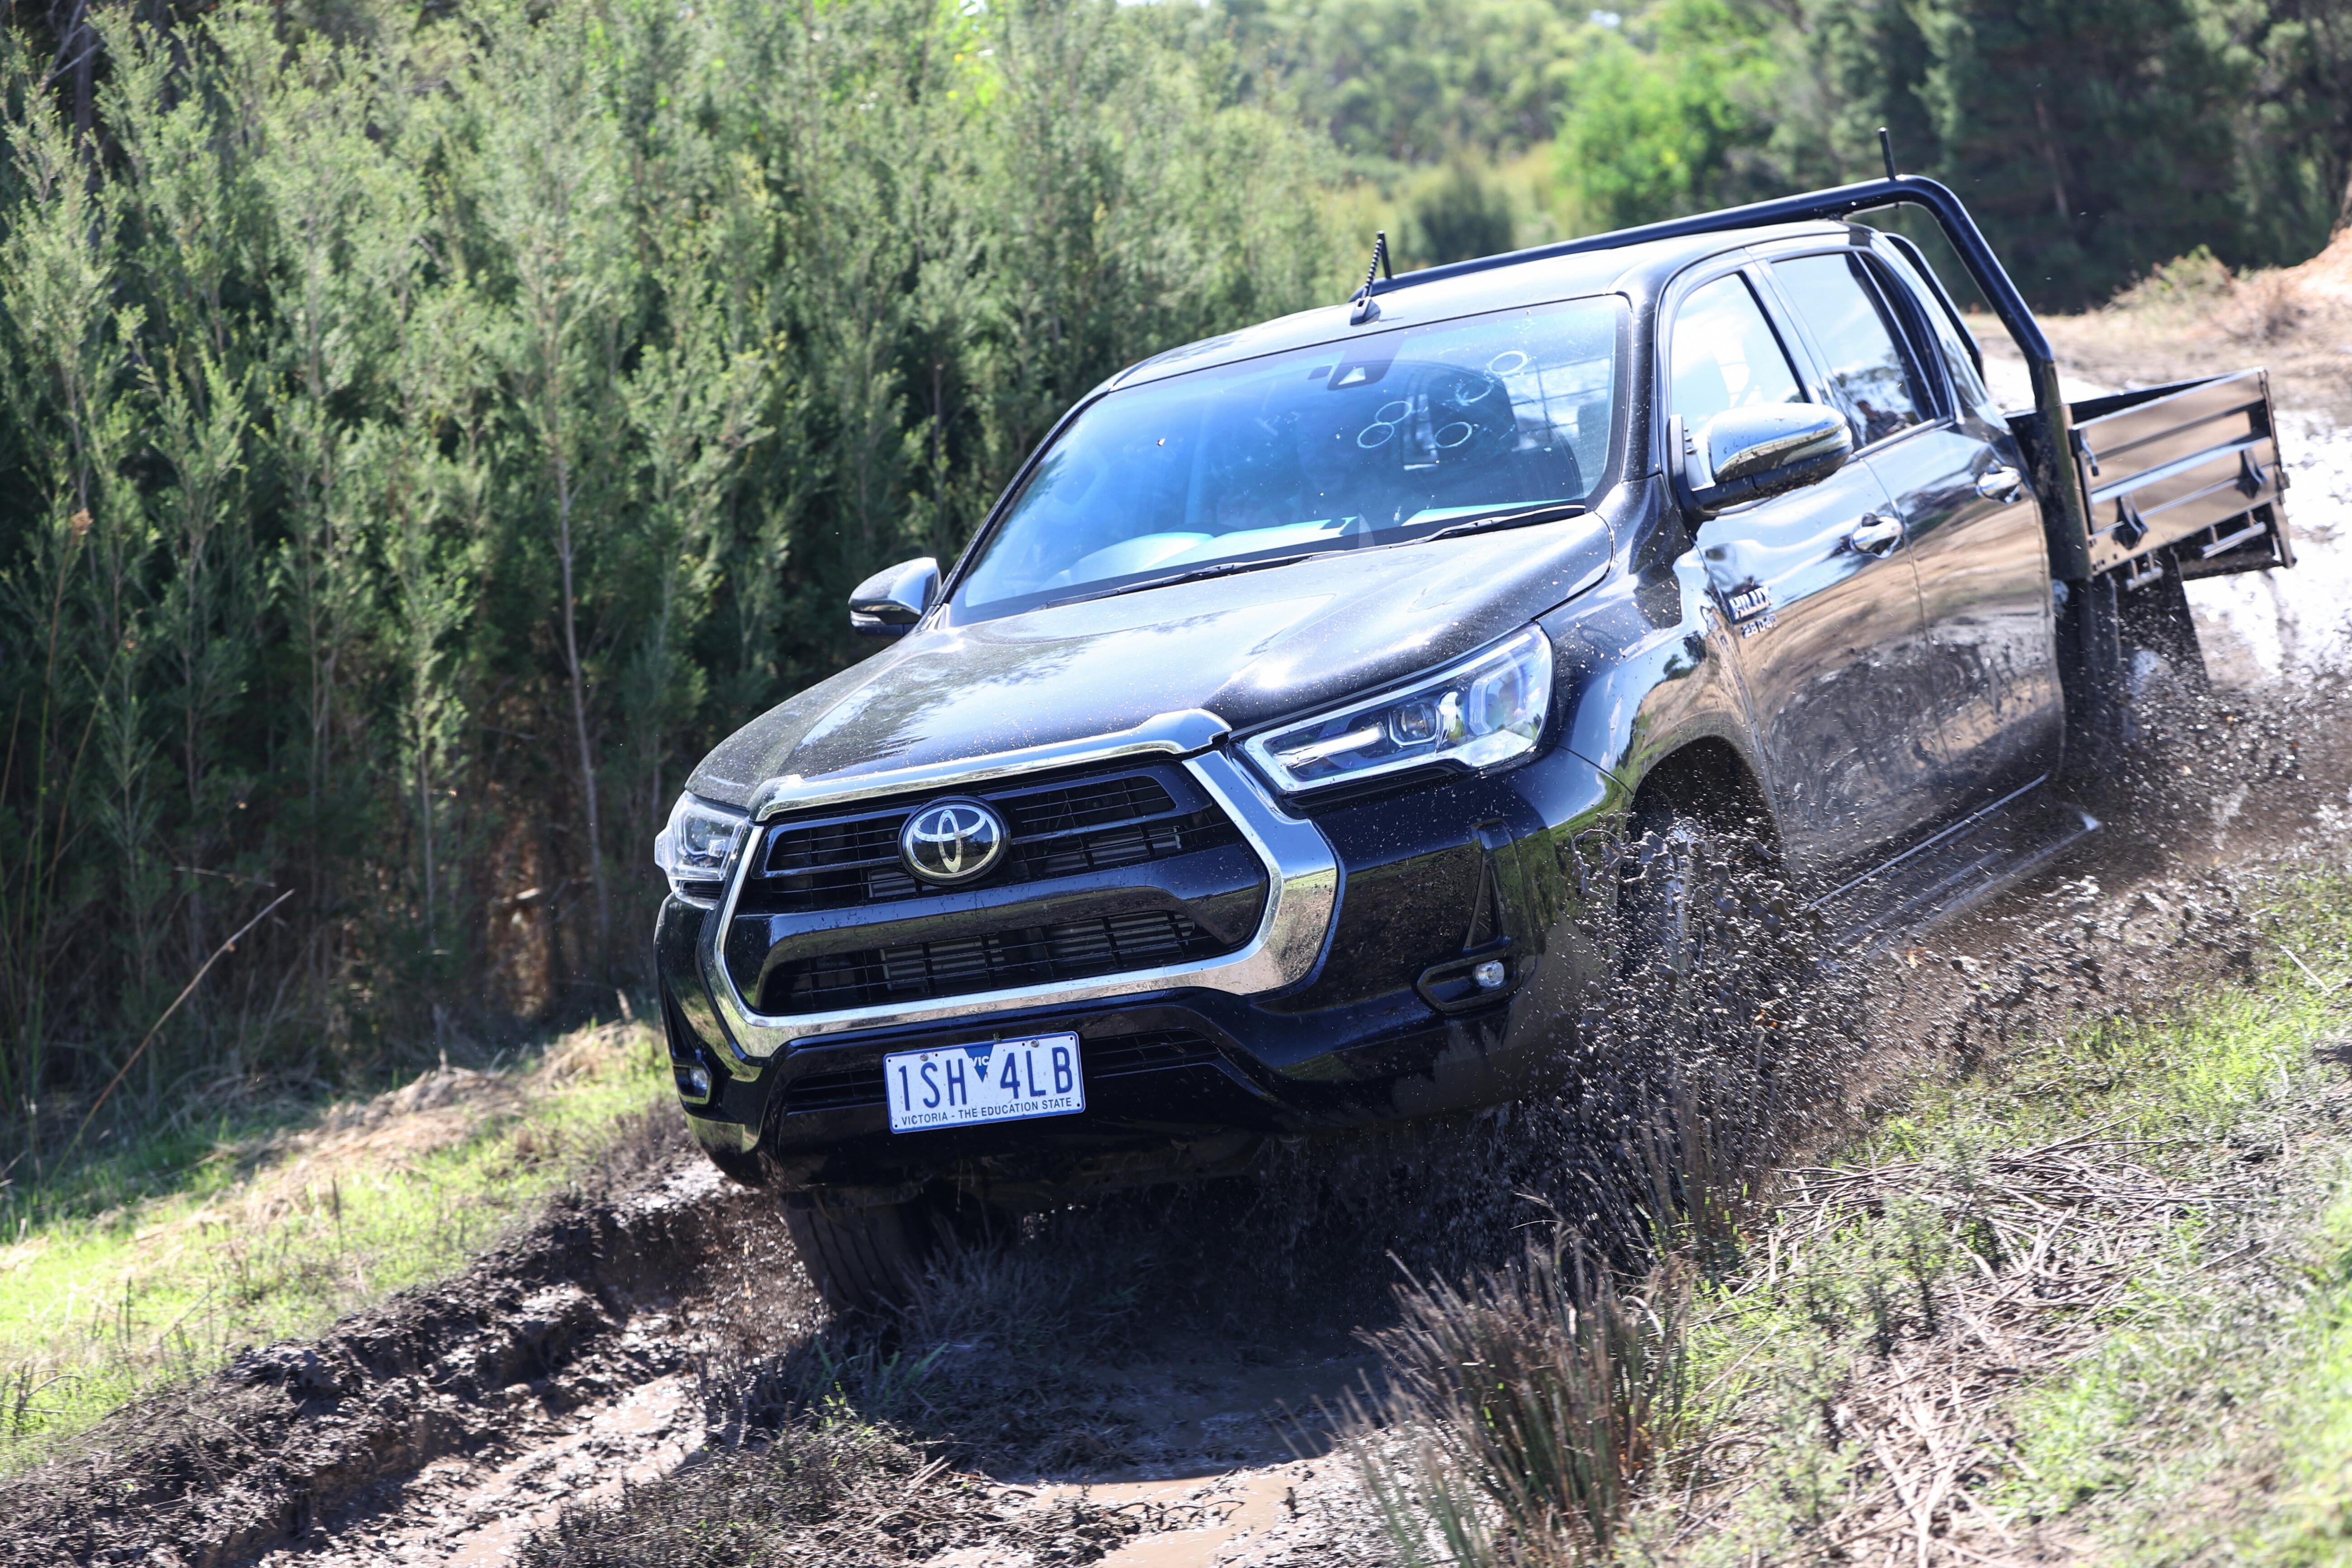 4 X 4 Australia Comparisons 2021 May 21 Toyota Hilux SR 5 4 X 4 Tracks Driving